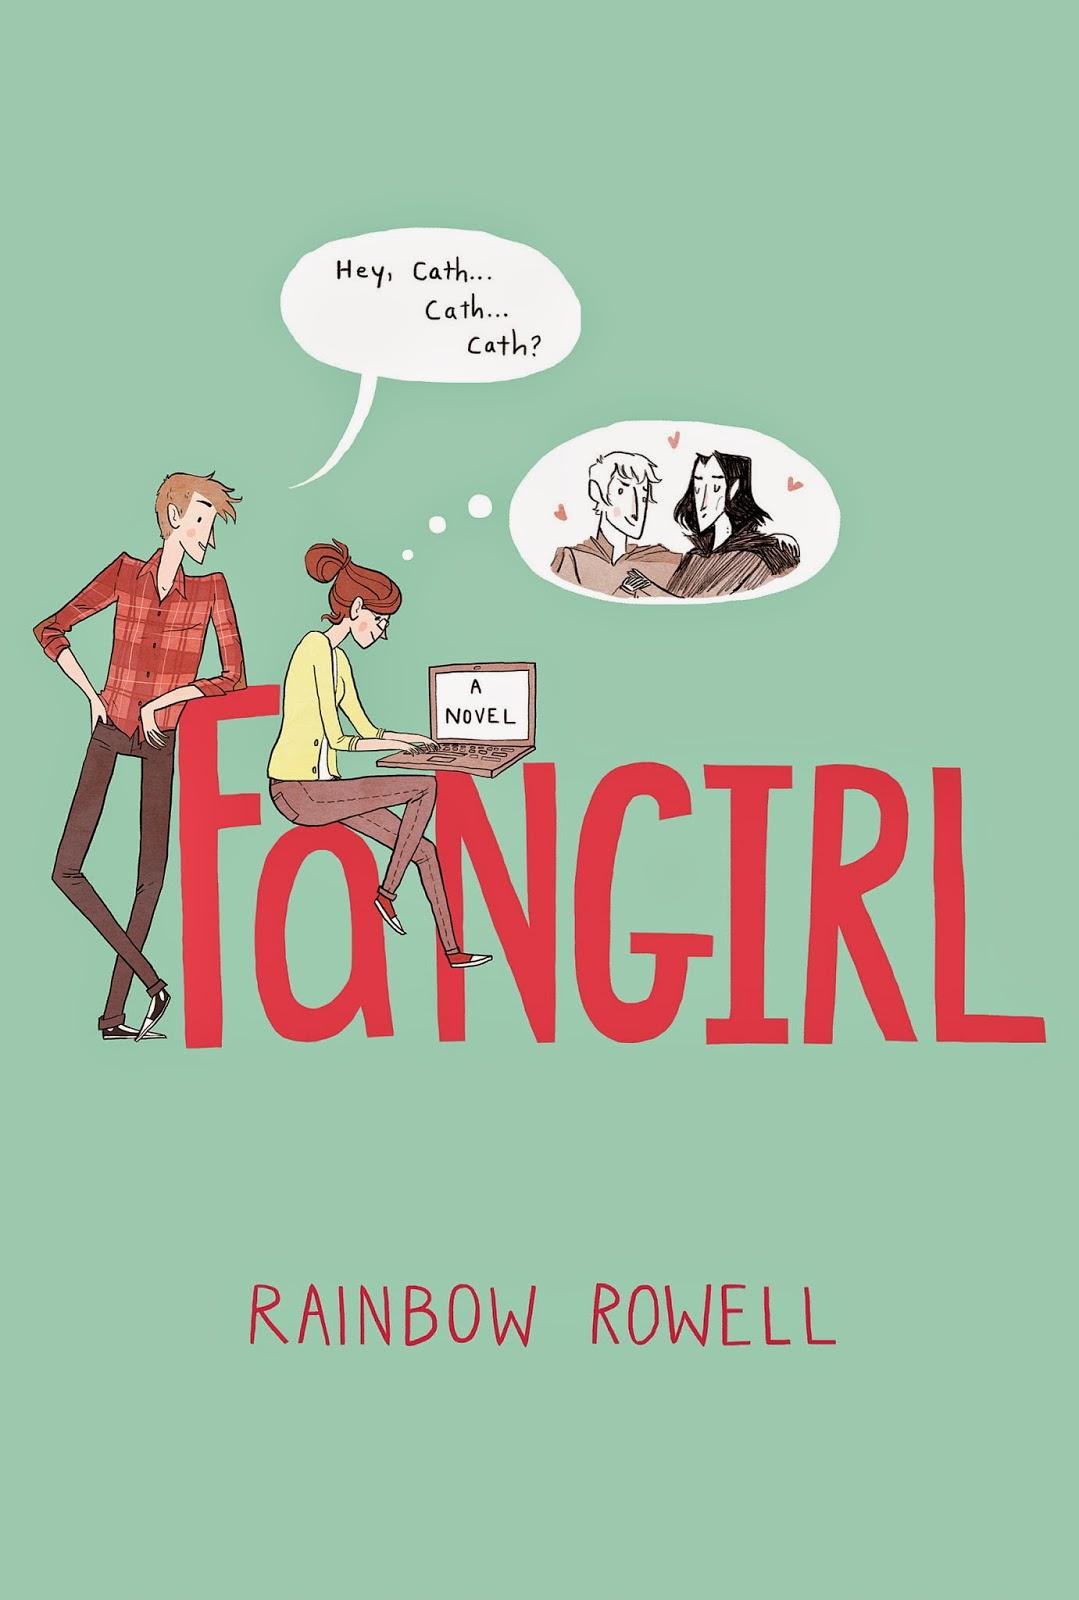 http://lavidadeunalectoraa.blogspot.mx/2015/01/resena-fangirl-de-rainbow-rowell.html